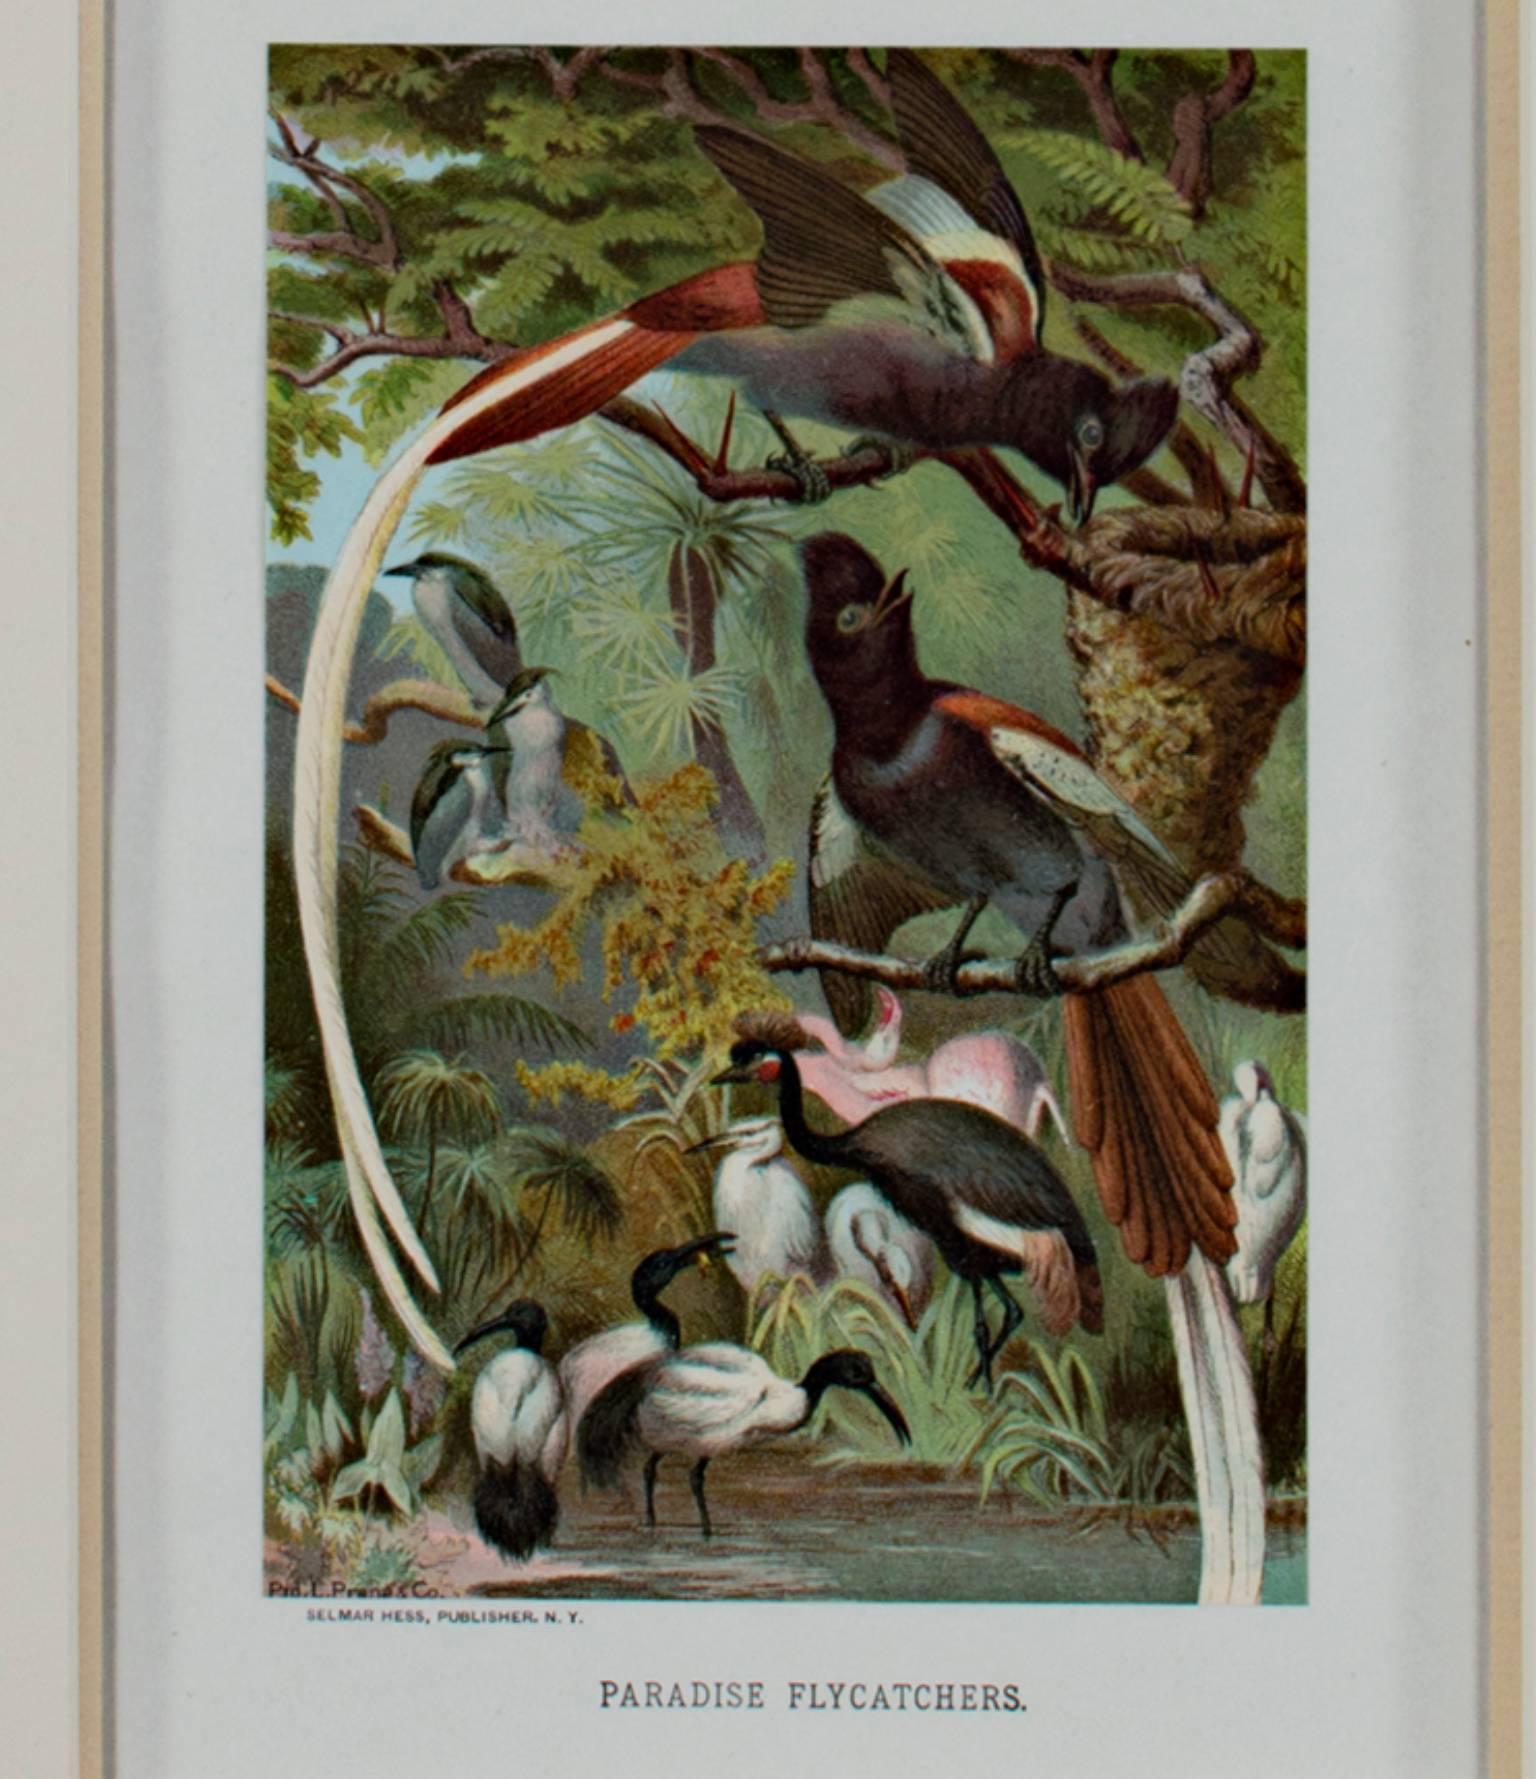 """Paradise Flycatchers,"" an Original Chromolithograph by Louis Prang"